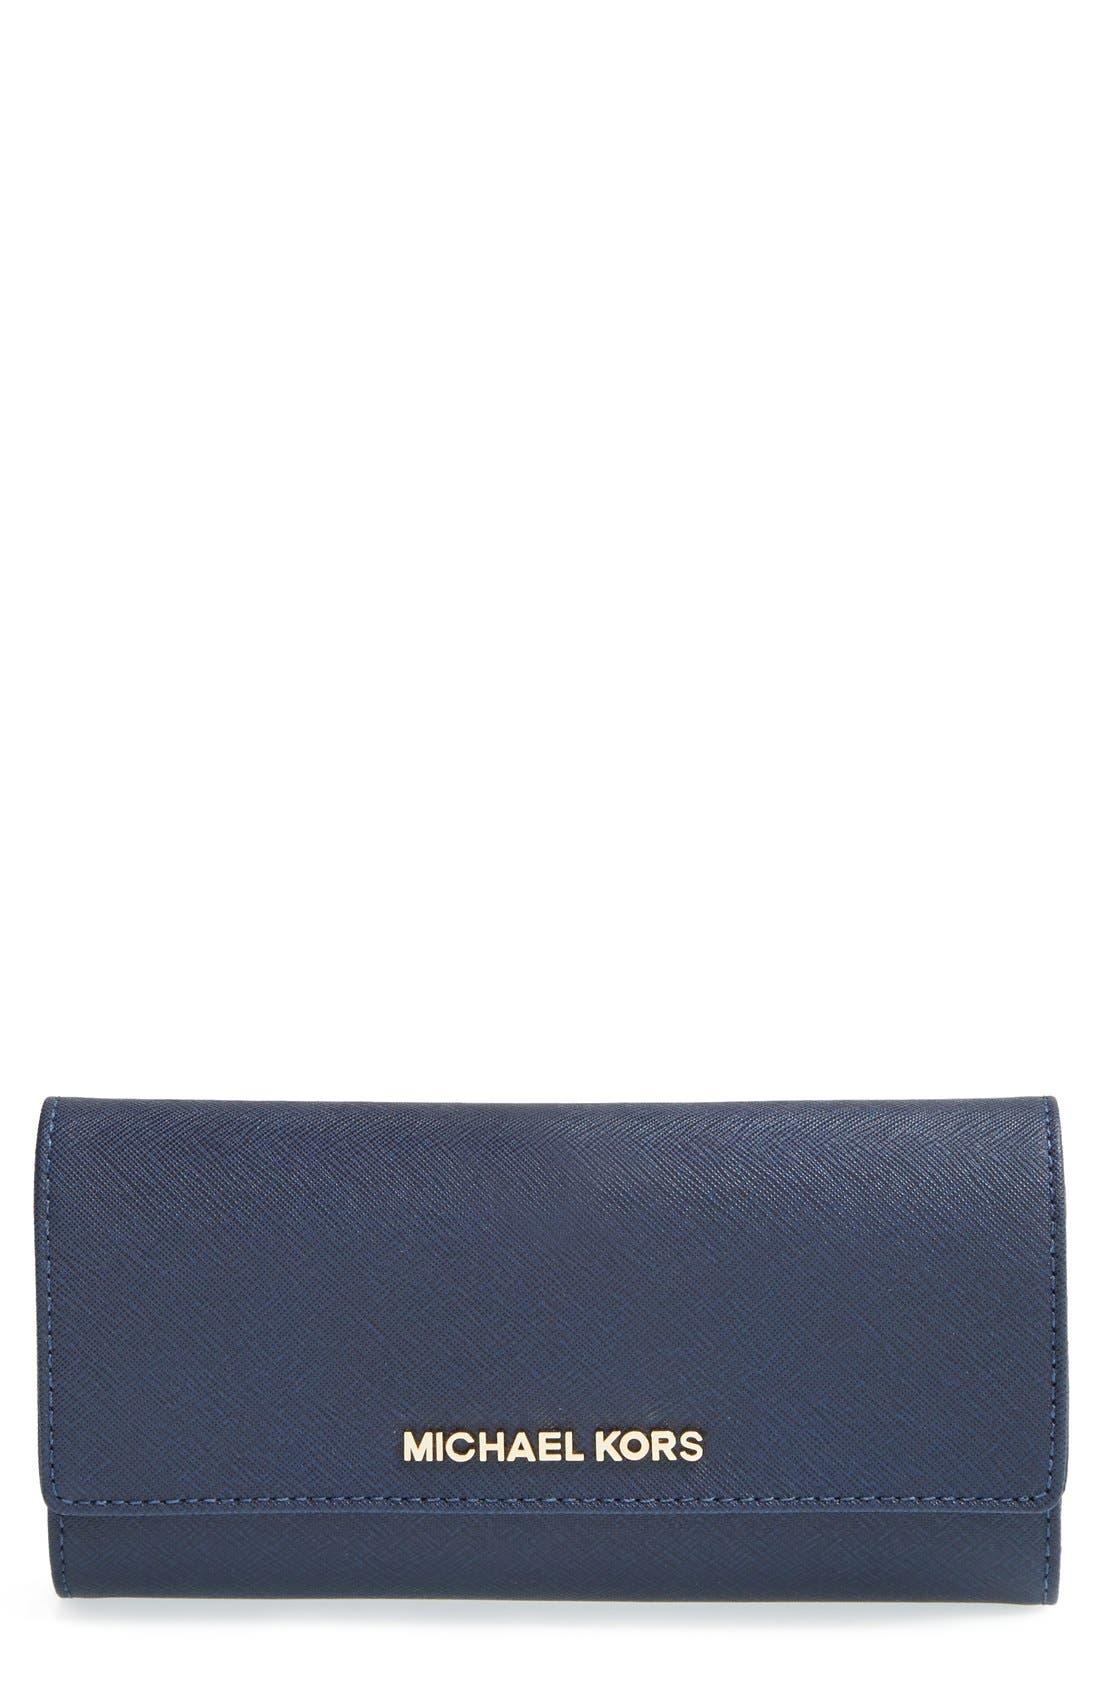 Main Image - MICHAEL Michael Kors 'Jet Set' Saffiano Leather Checkbook Wallet